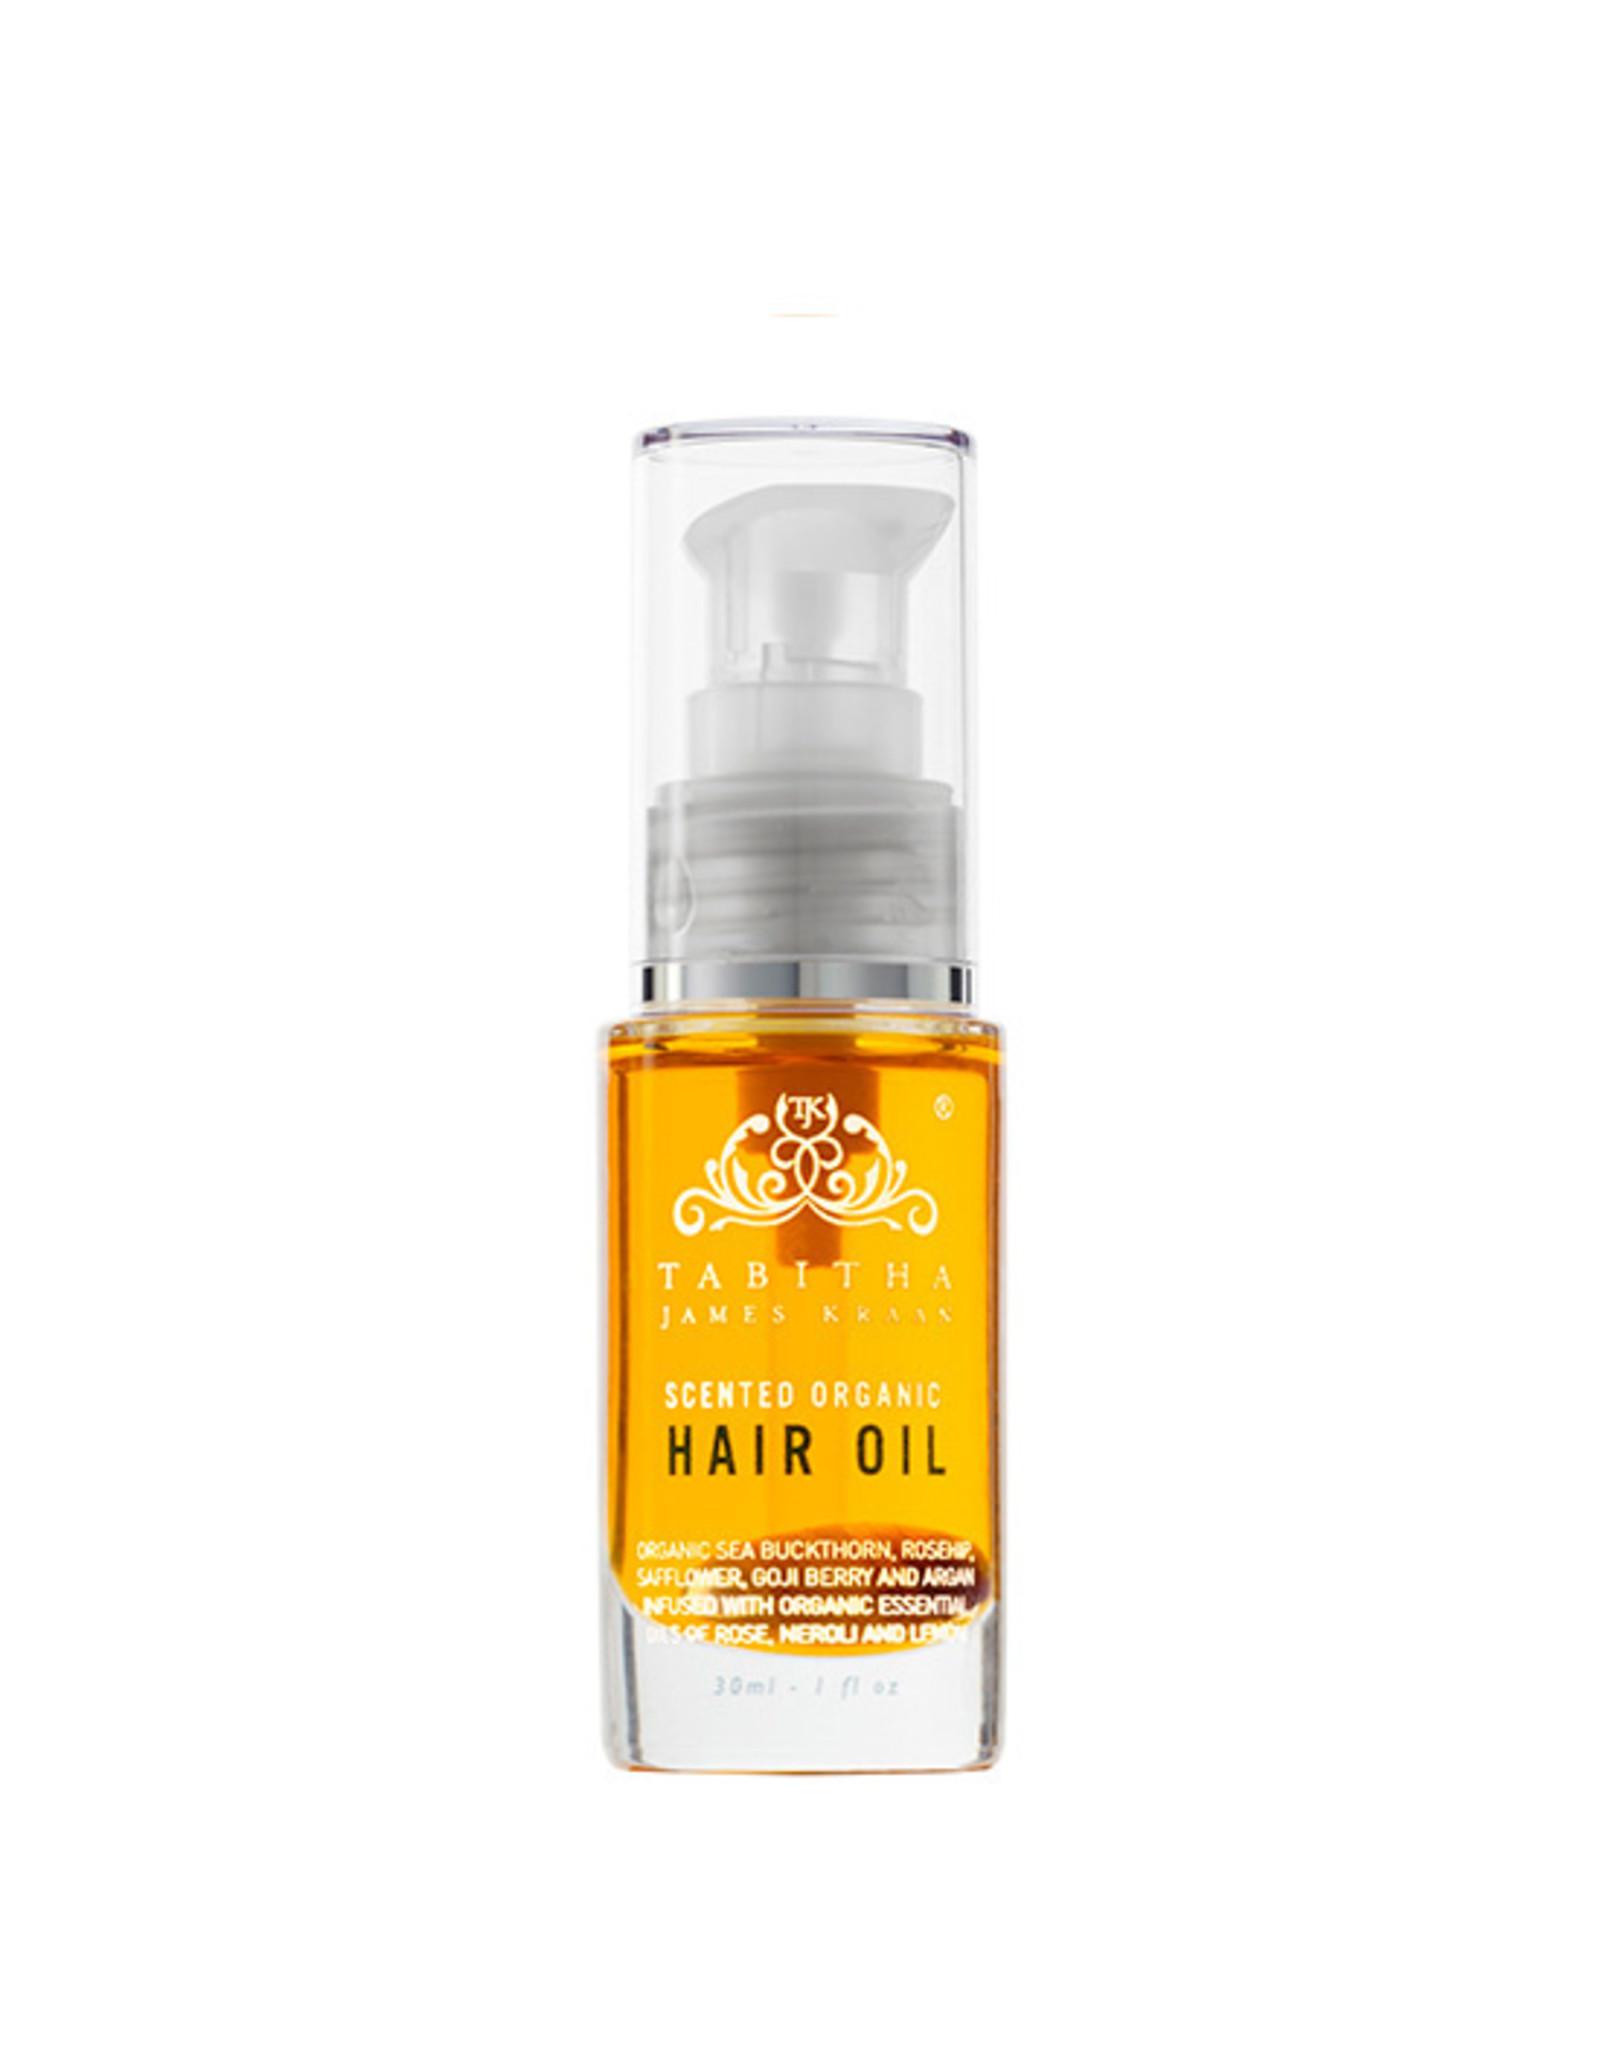 Tabitha James Kraan Scented Organic Hair Oil